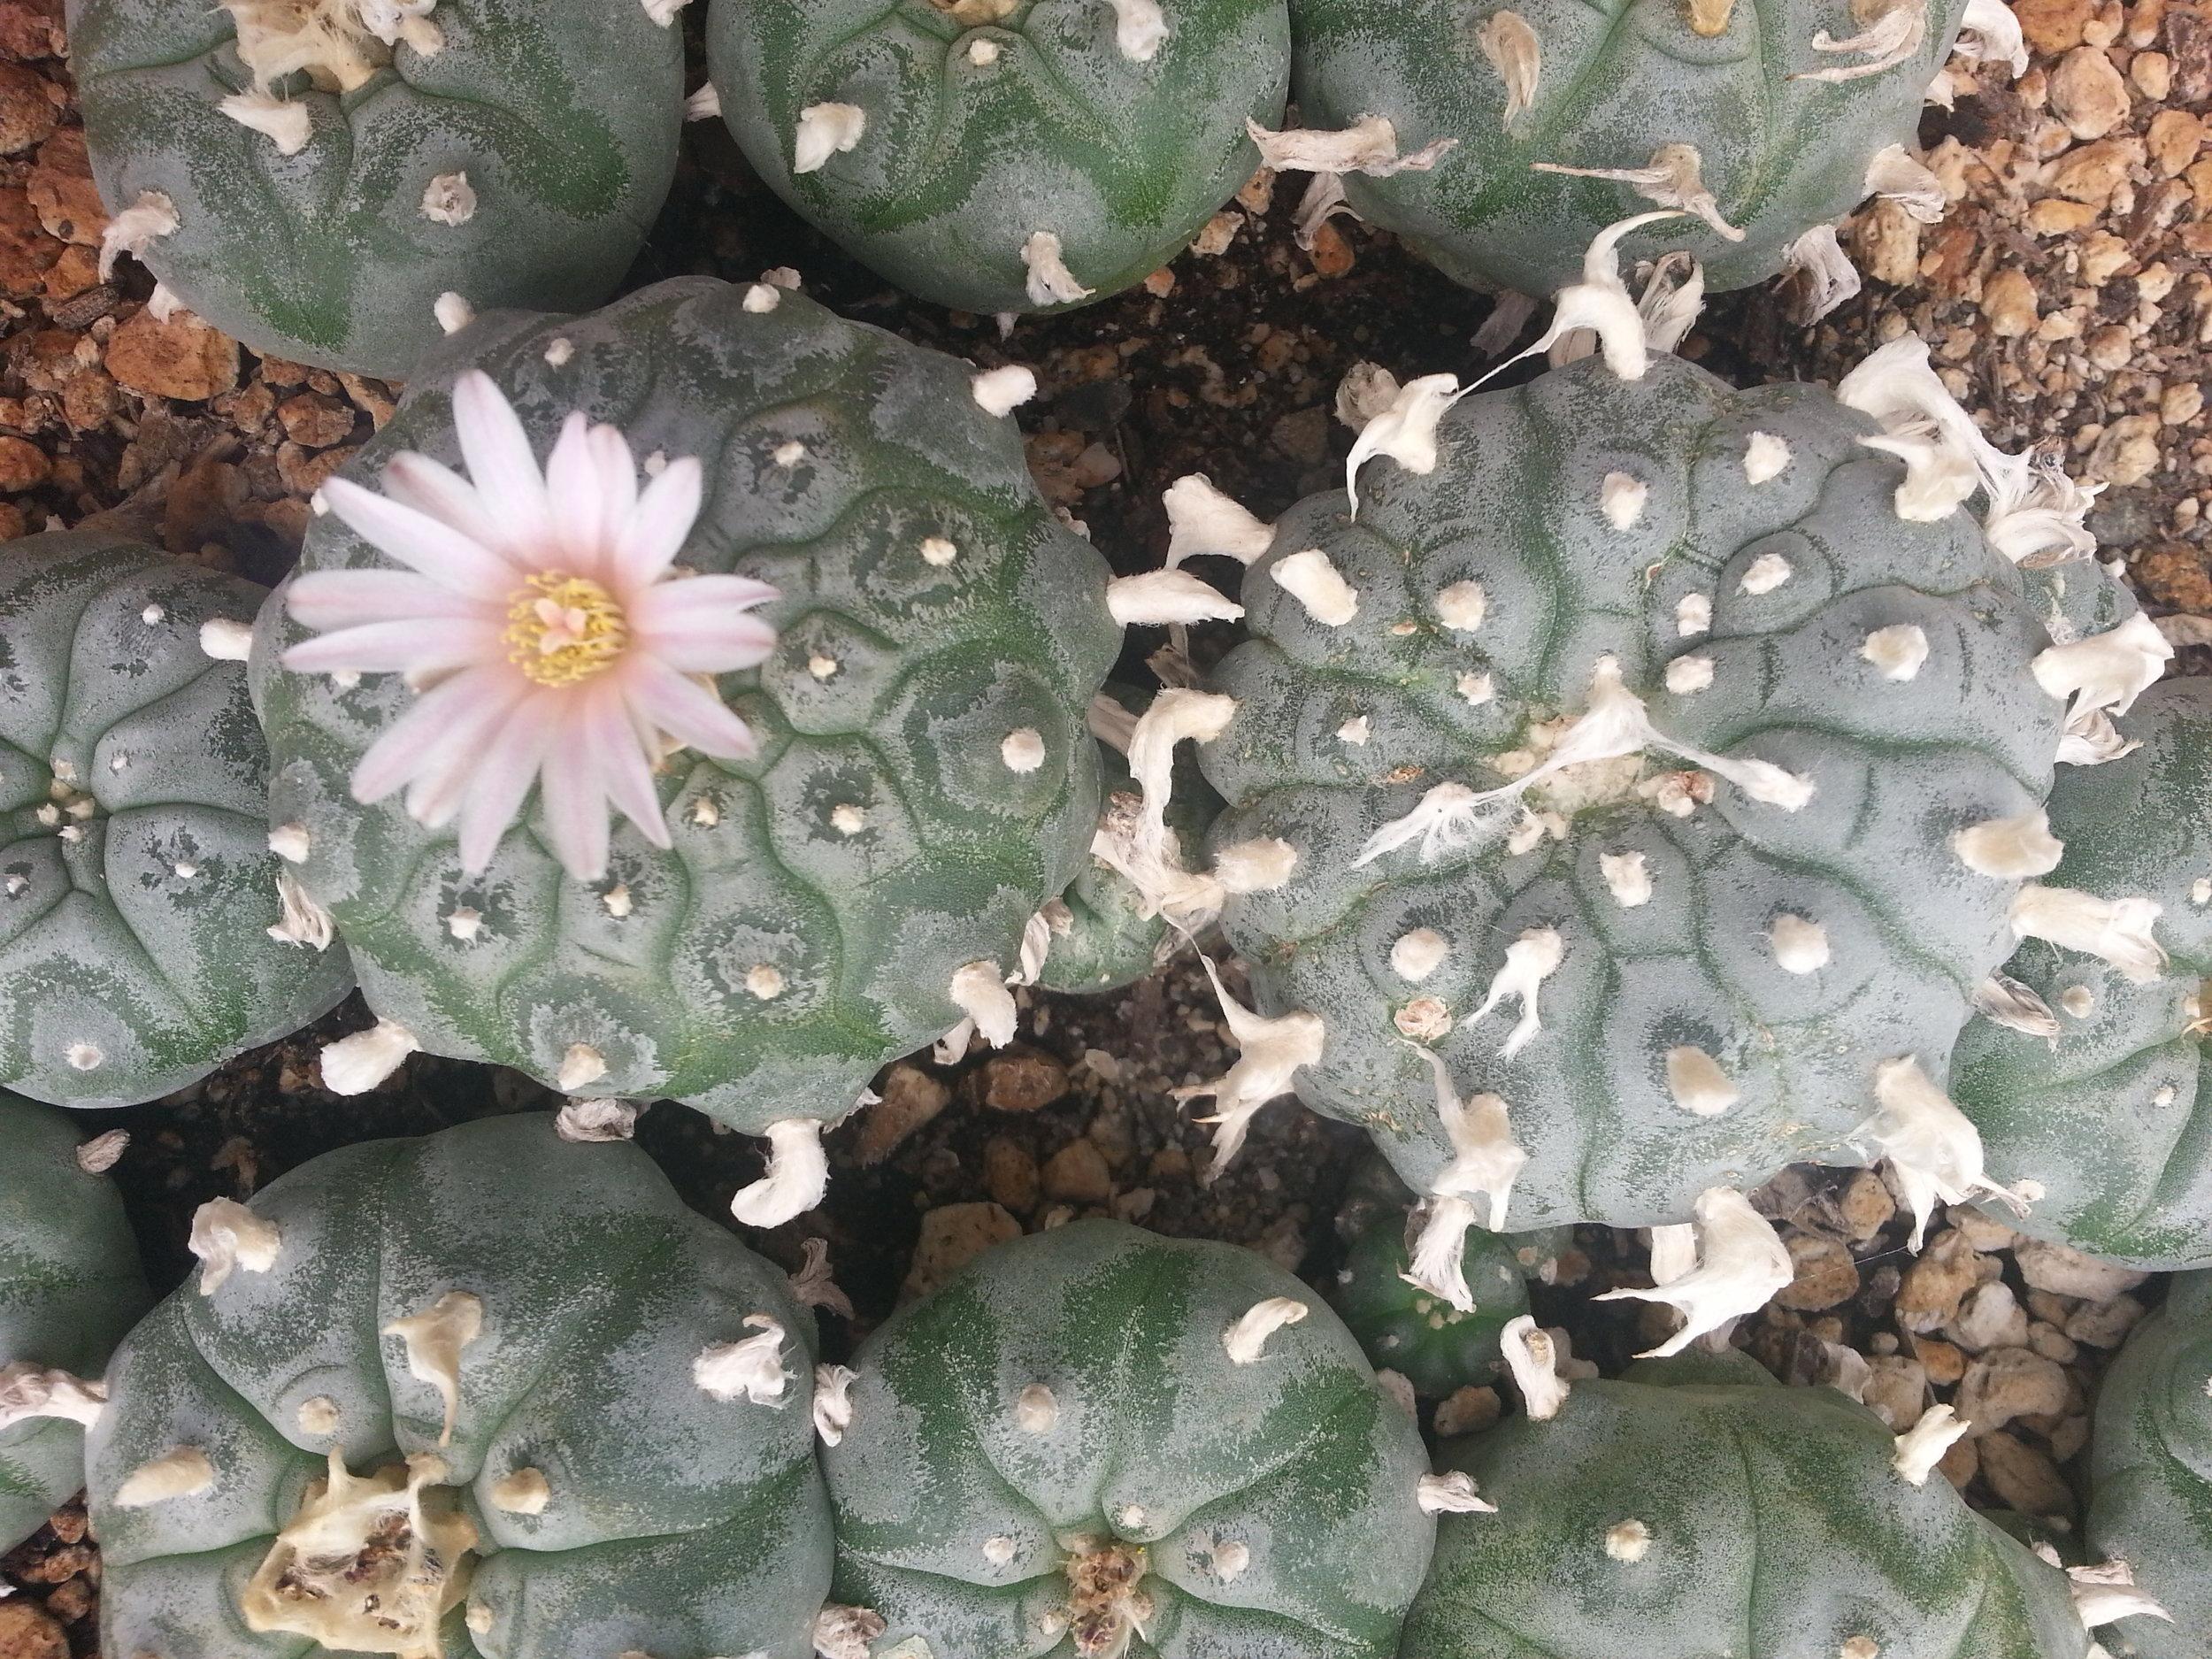 Peyote in bloom, Arizona.